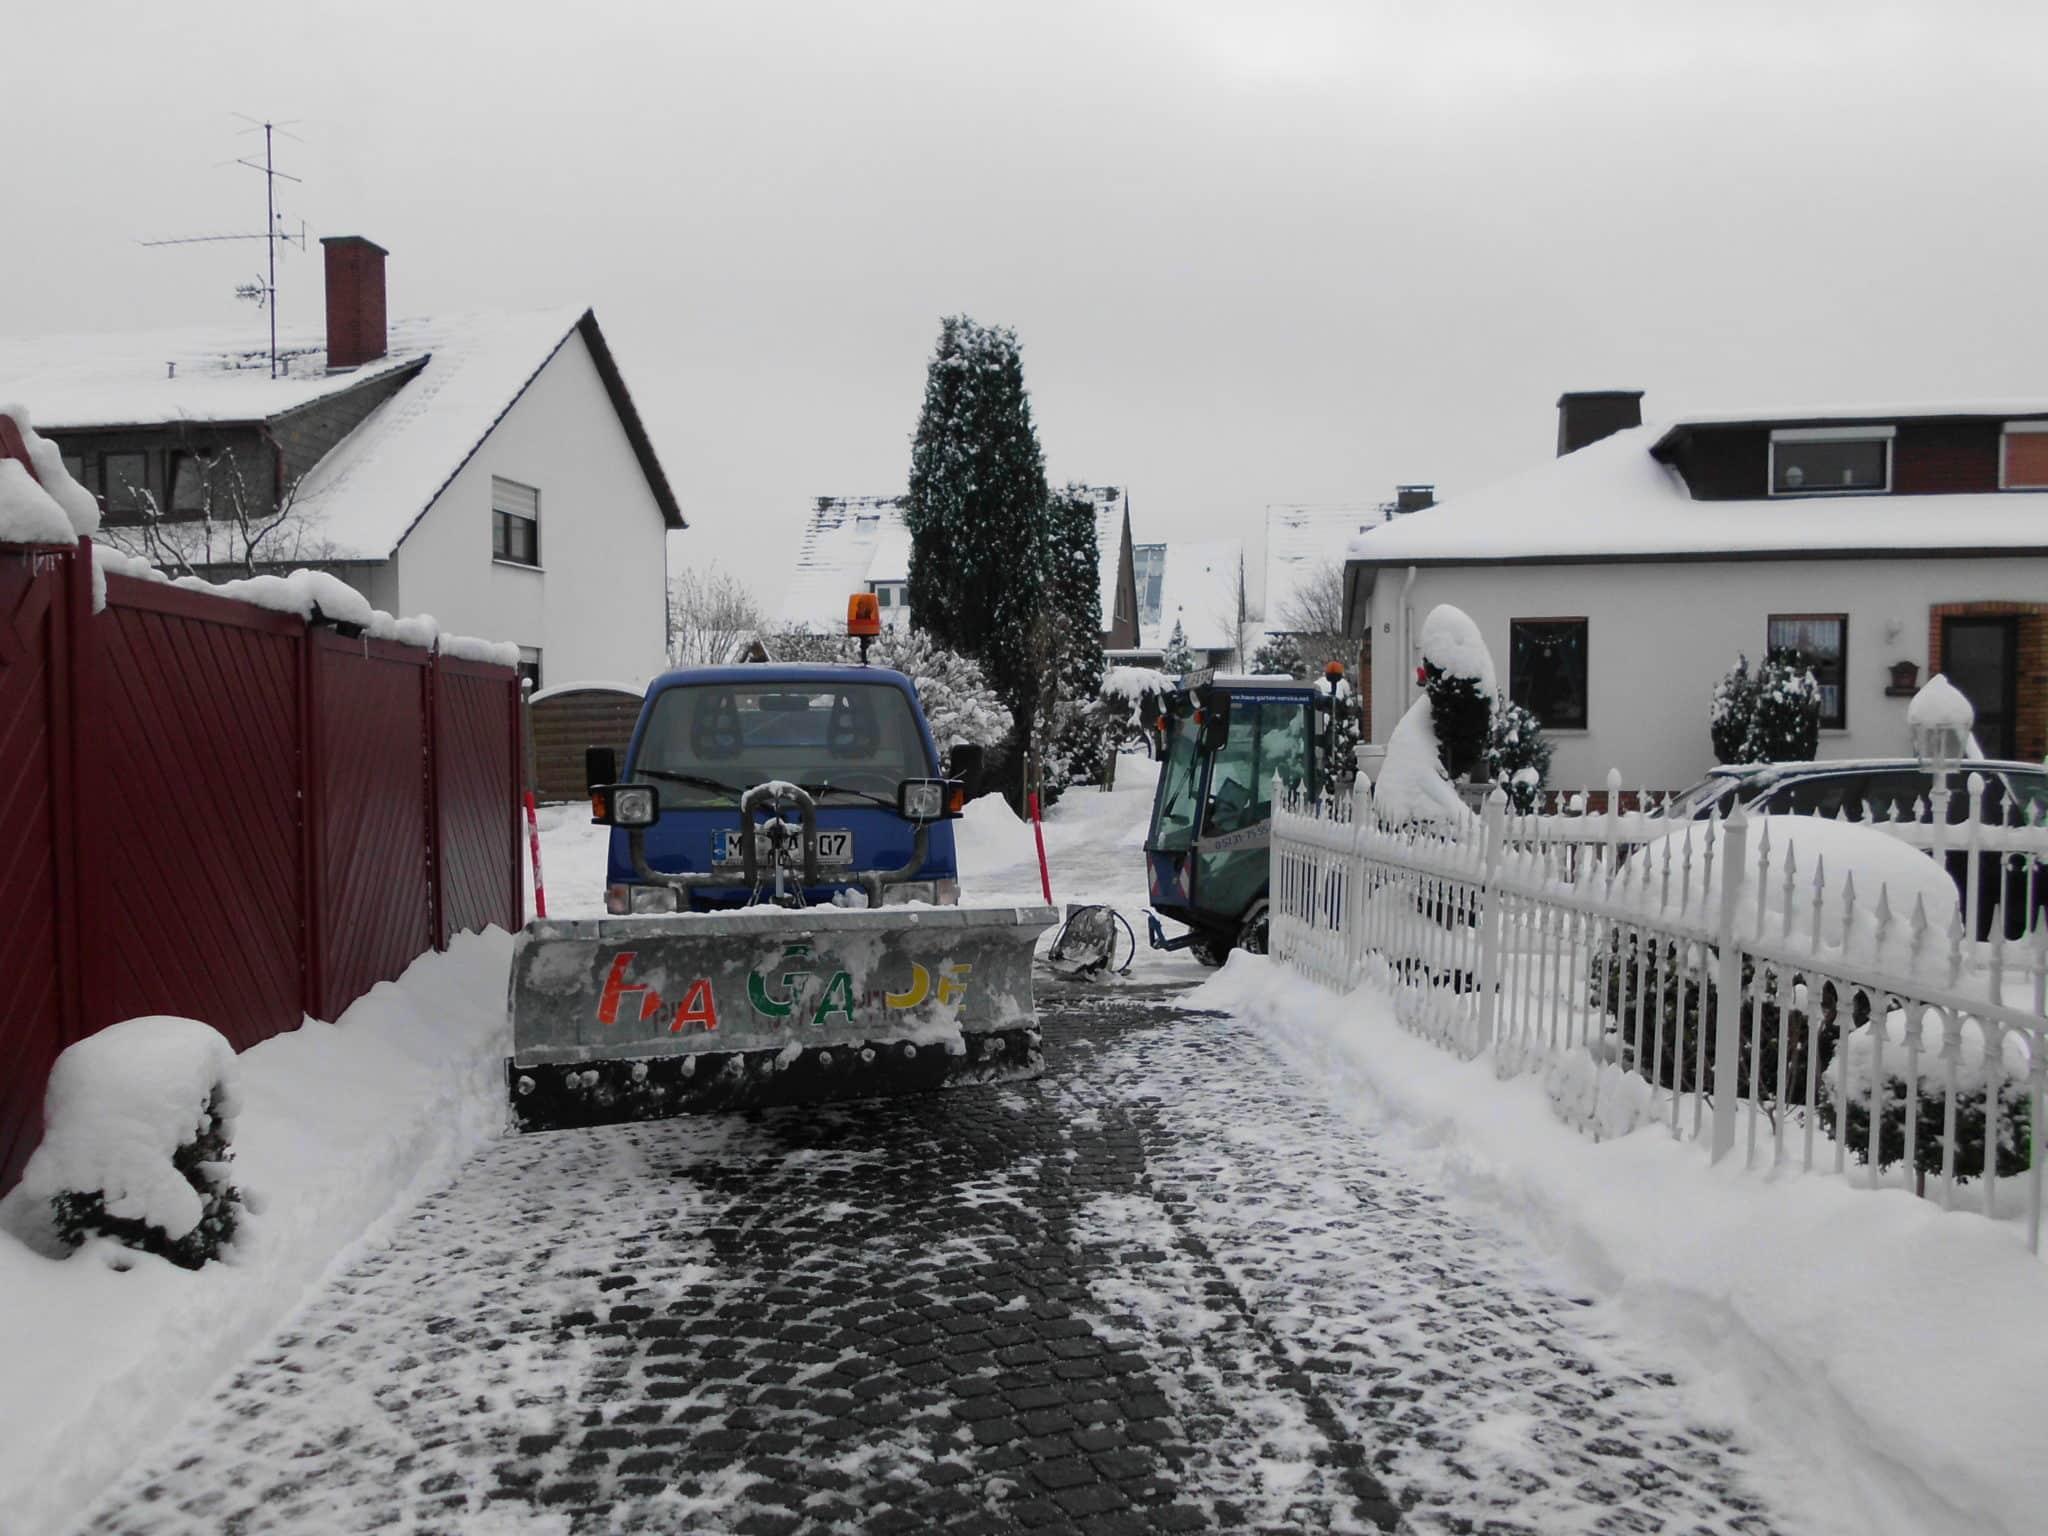 Winterdienstan Wohnhäusern Bad Oeynhausen